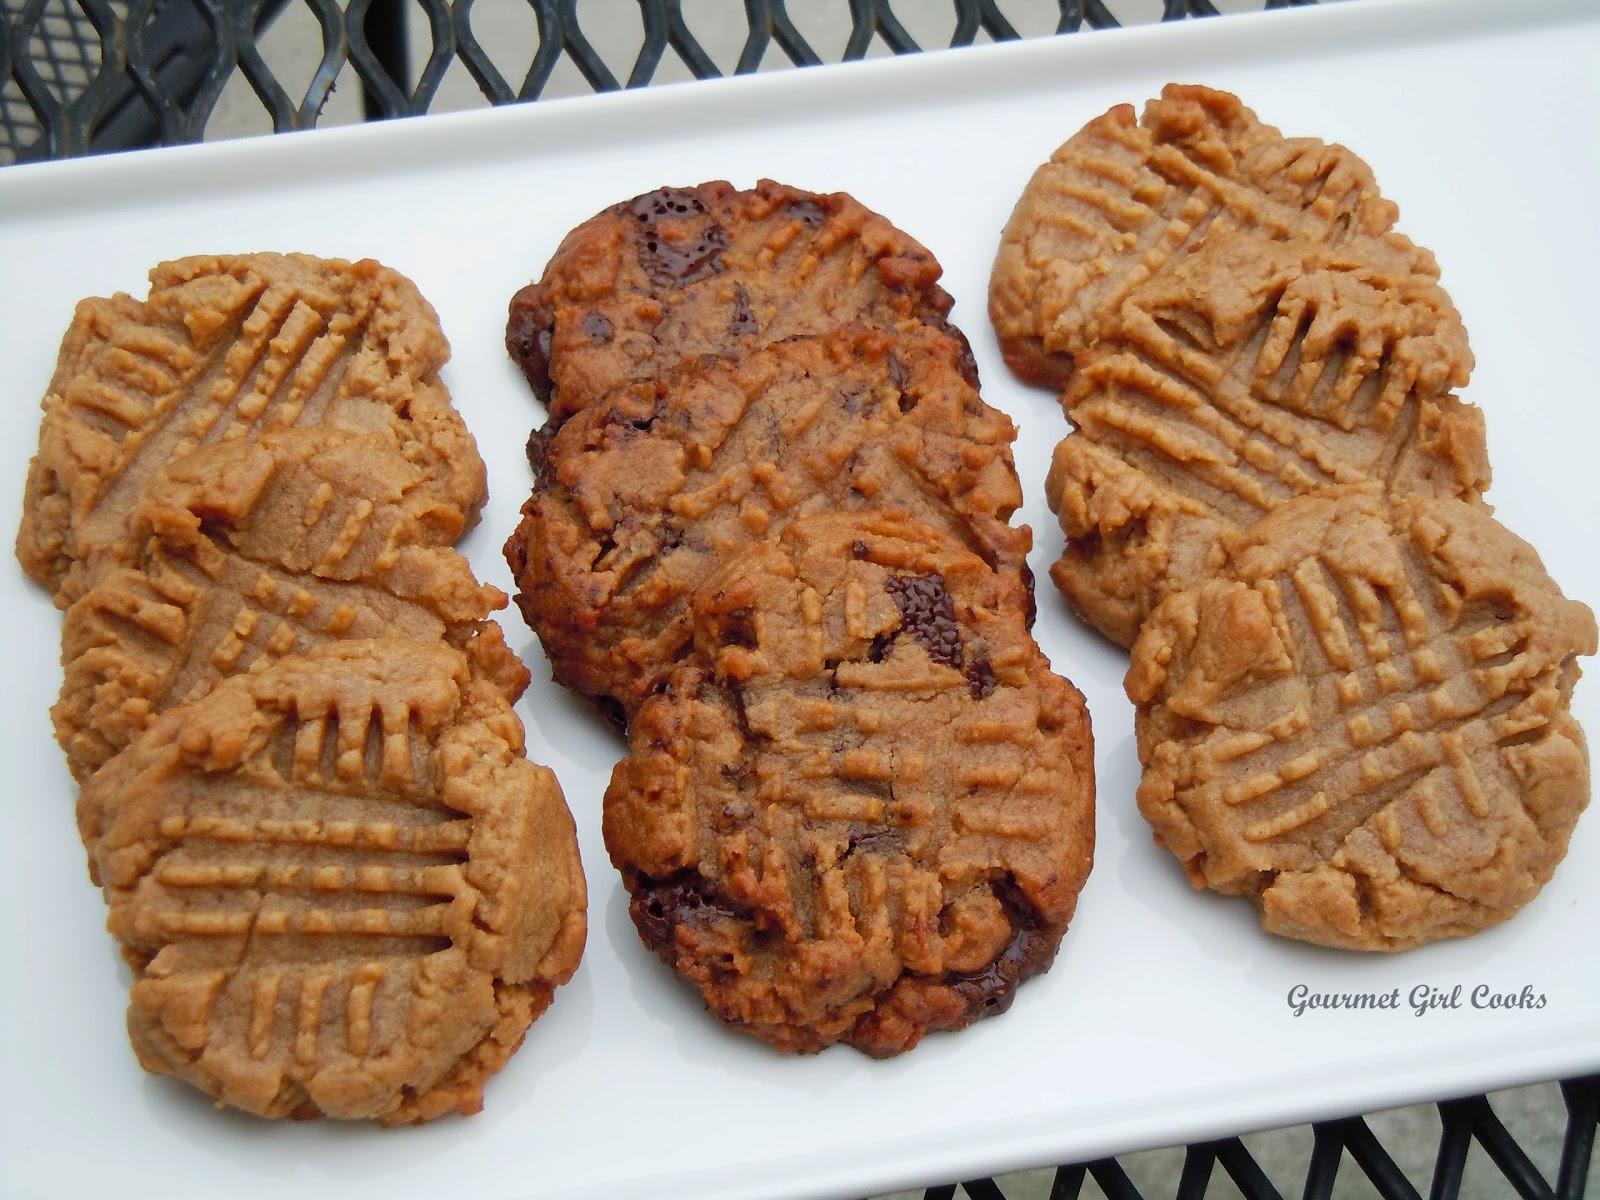 Easy Peanut Butter Cookies  Gourmet Girl Cooks Easy Peanut Butter Cookies